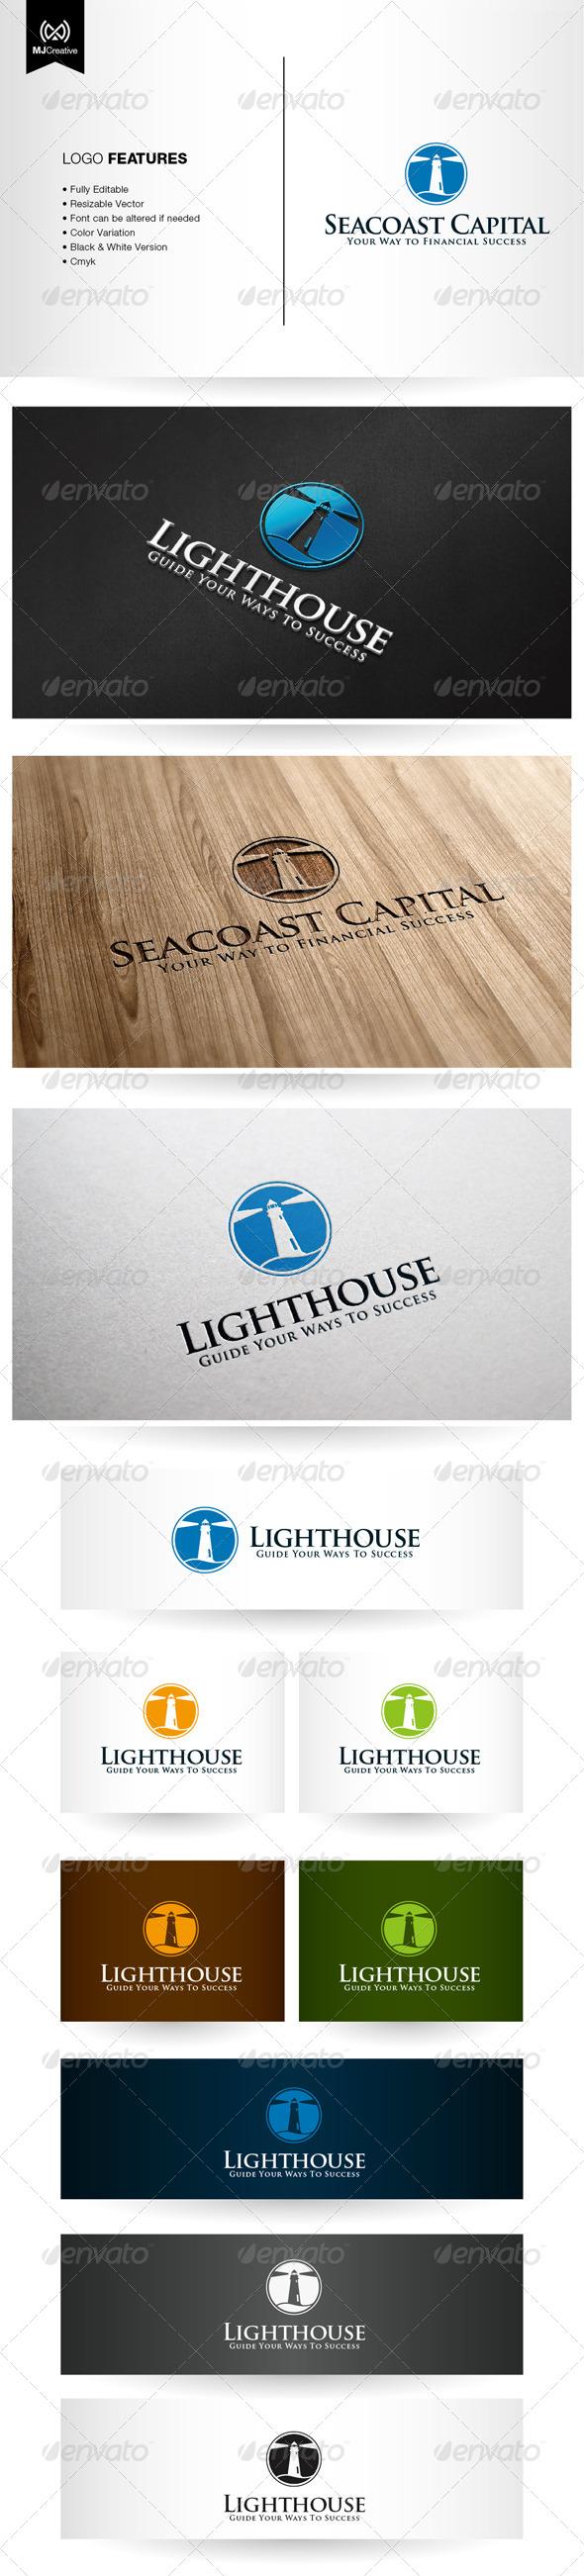 Seacoast and Lighthouse Logo